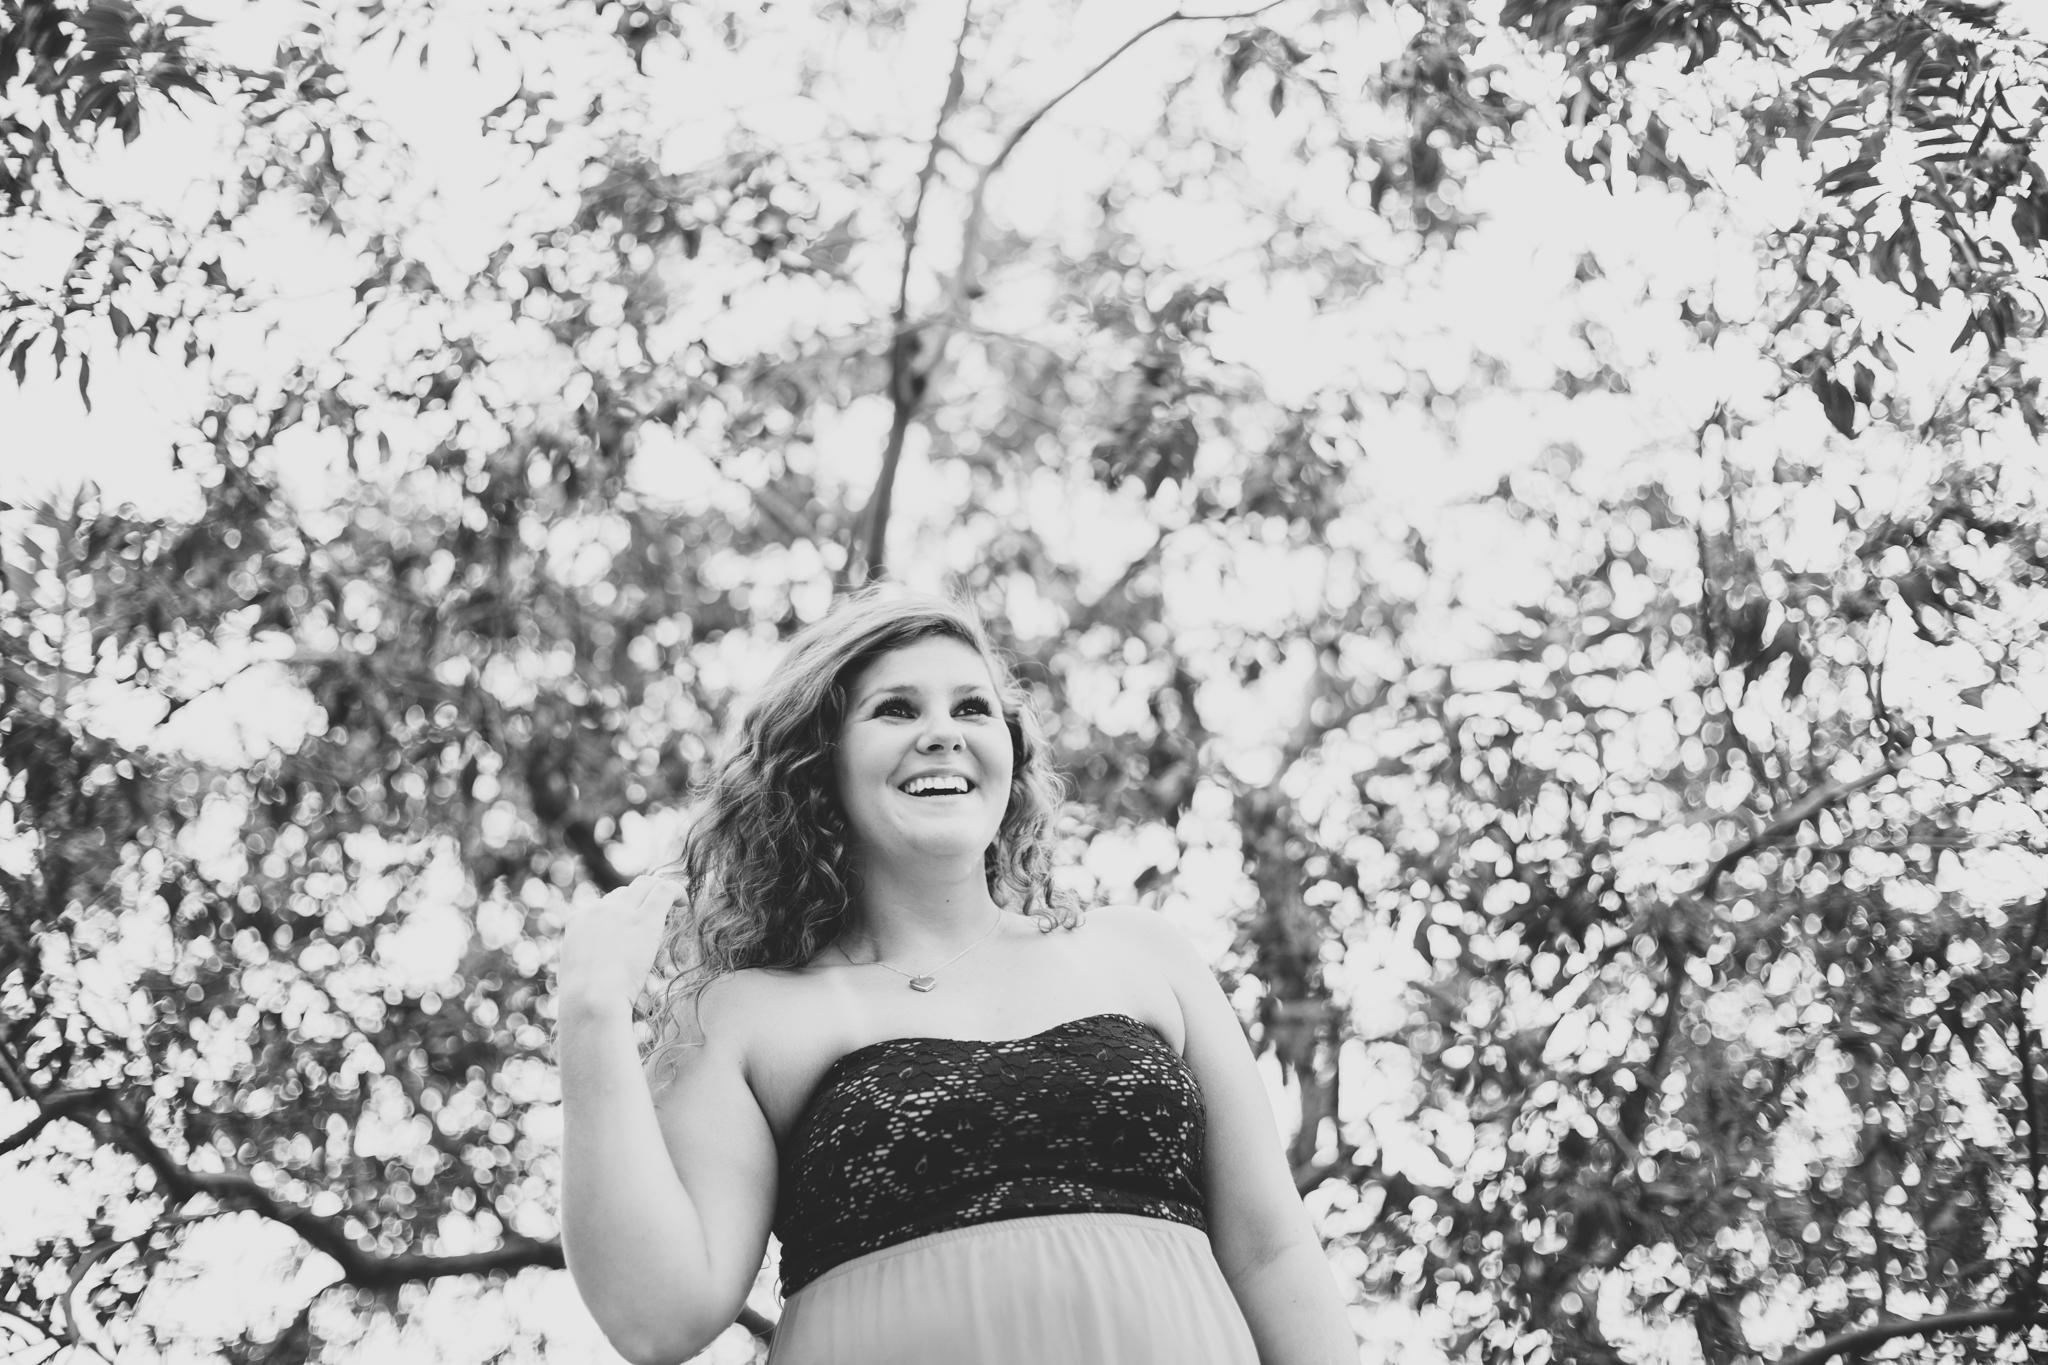 Marissa BW Laughs Beneath Tree Senior Photo